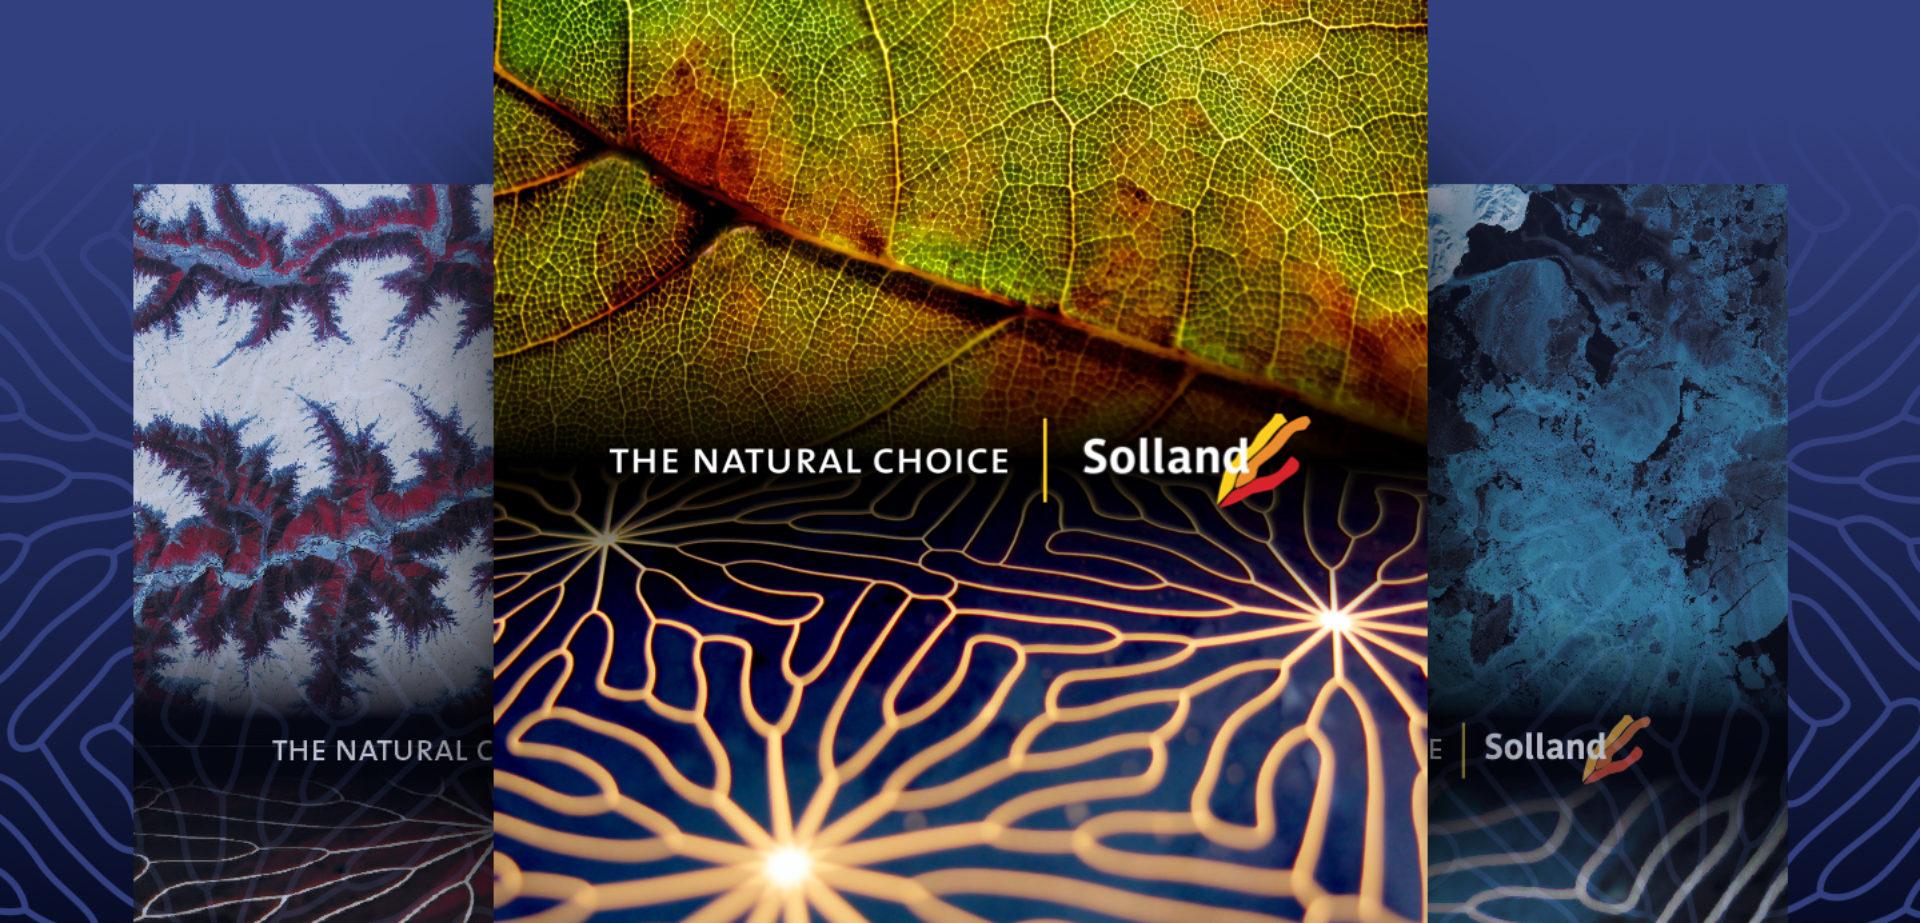 Solland Solar banner - Rene Verkaart)